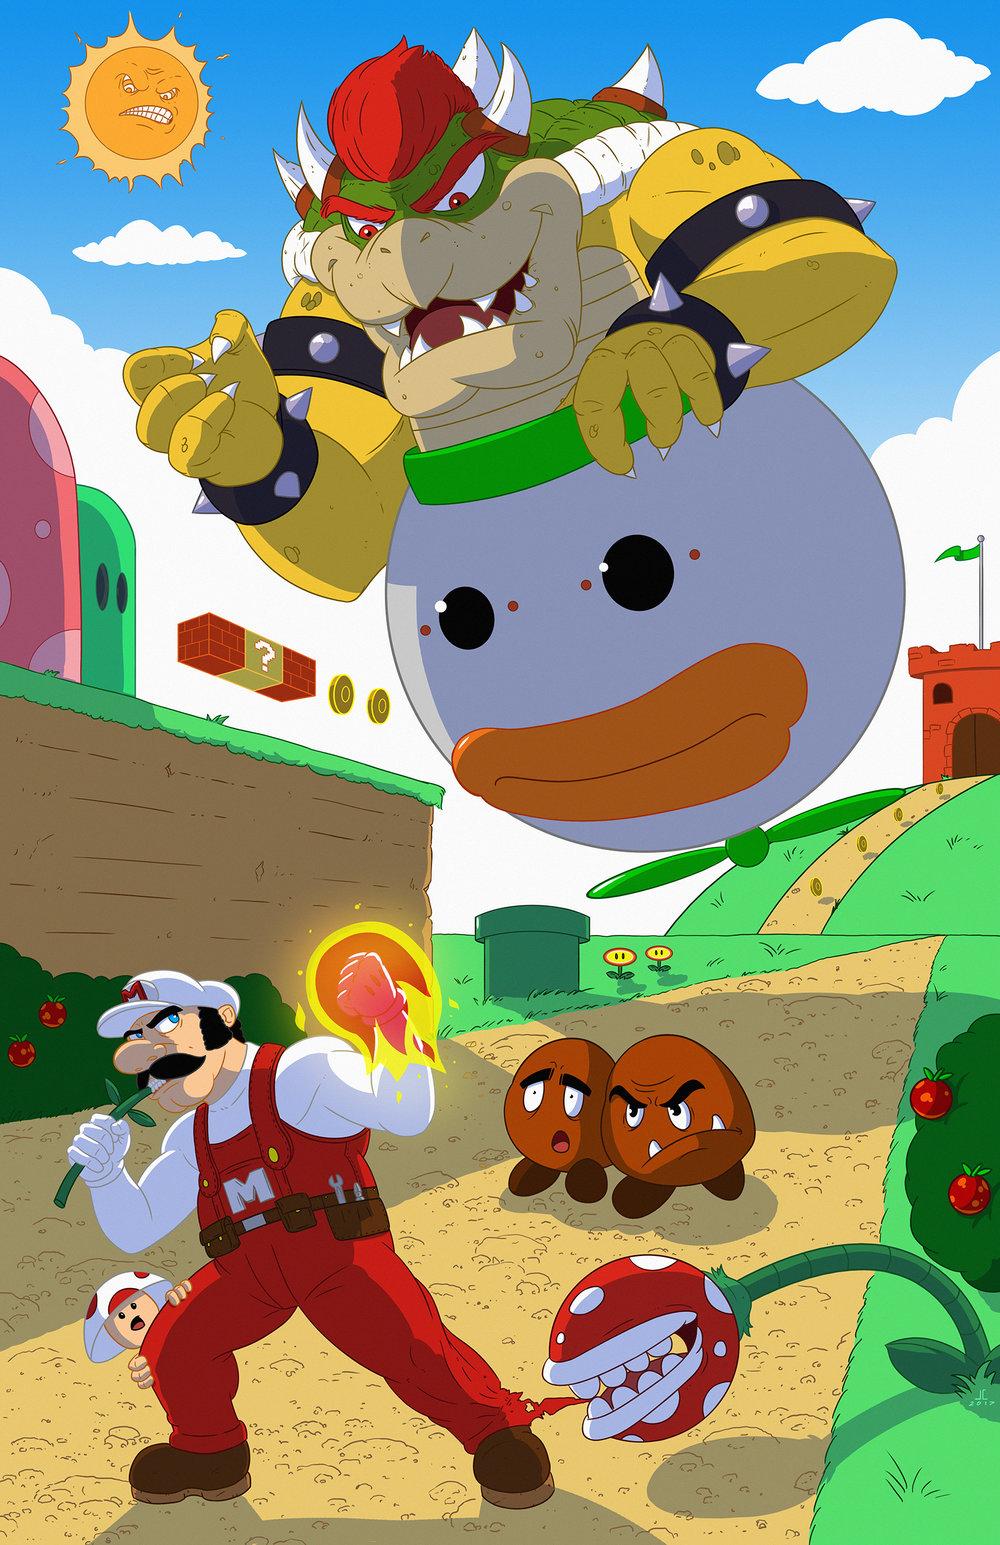 Jon-Caron-Super-Mario-Bros-Poster-Nintendo-JC-Art.jpg